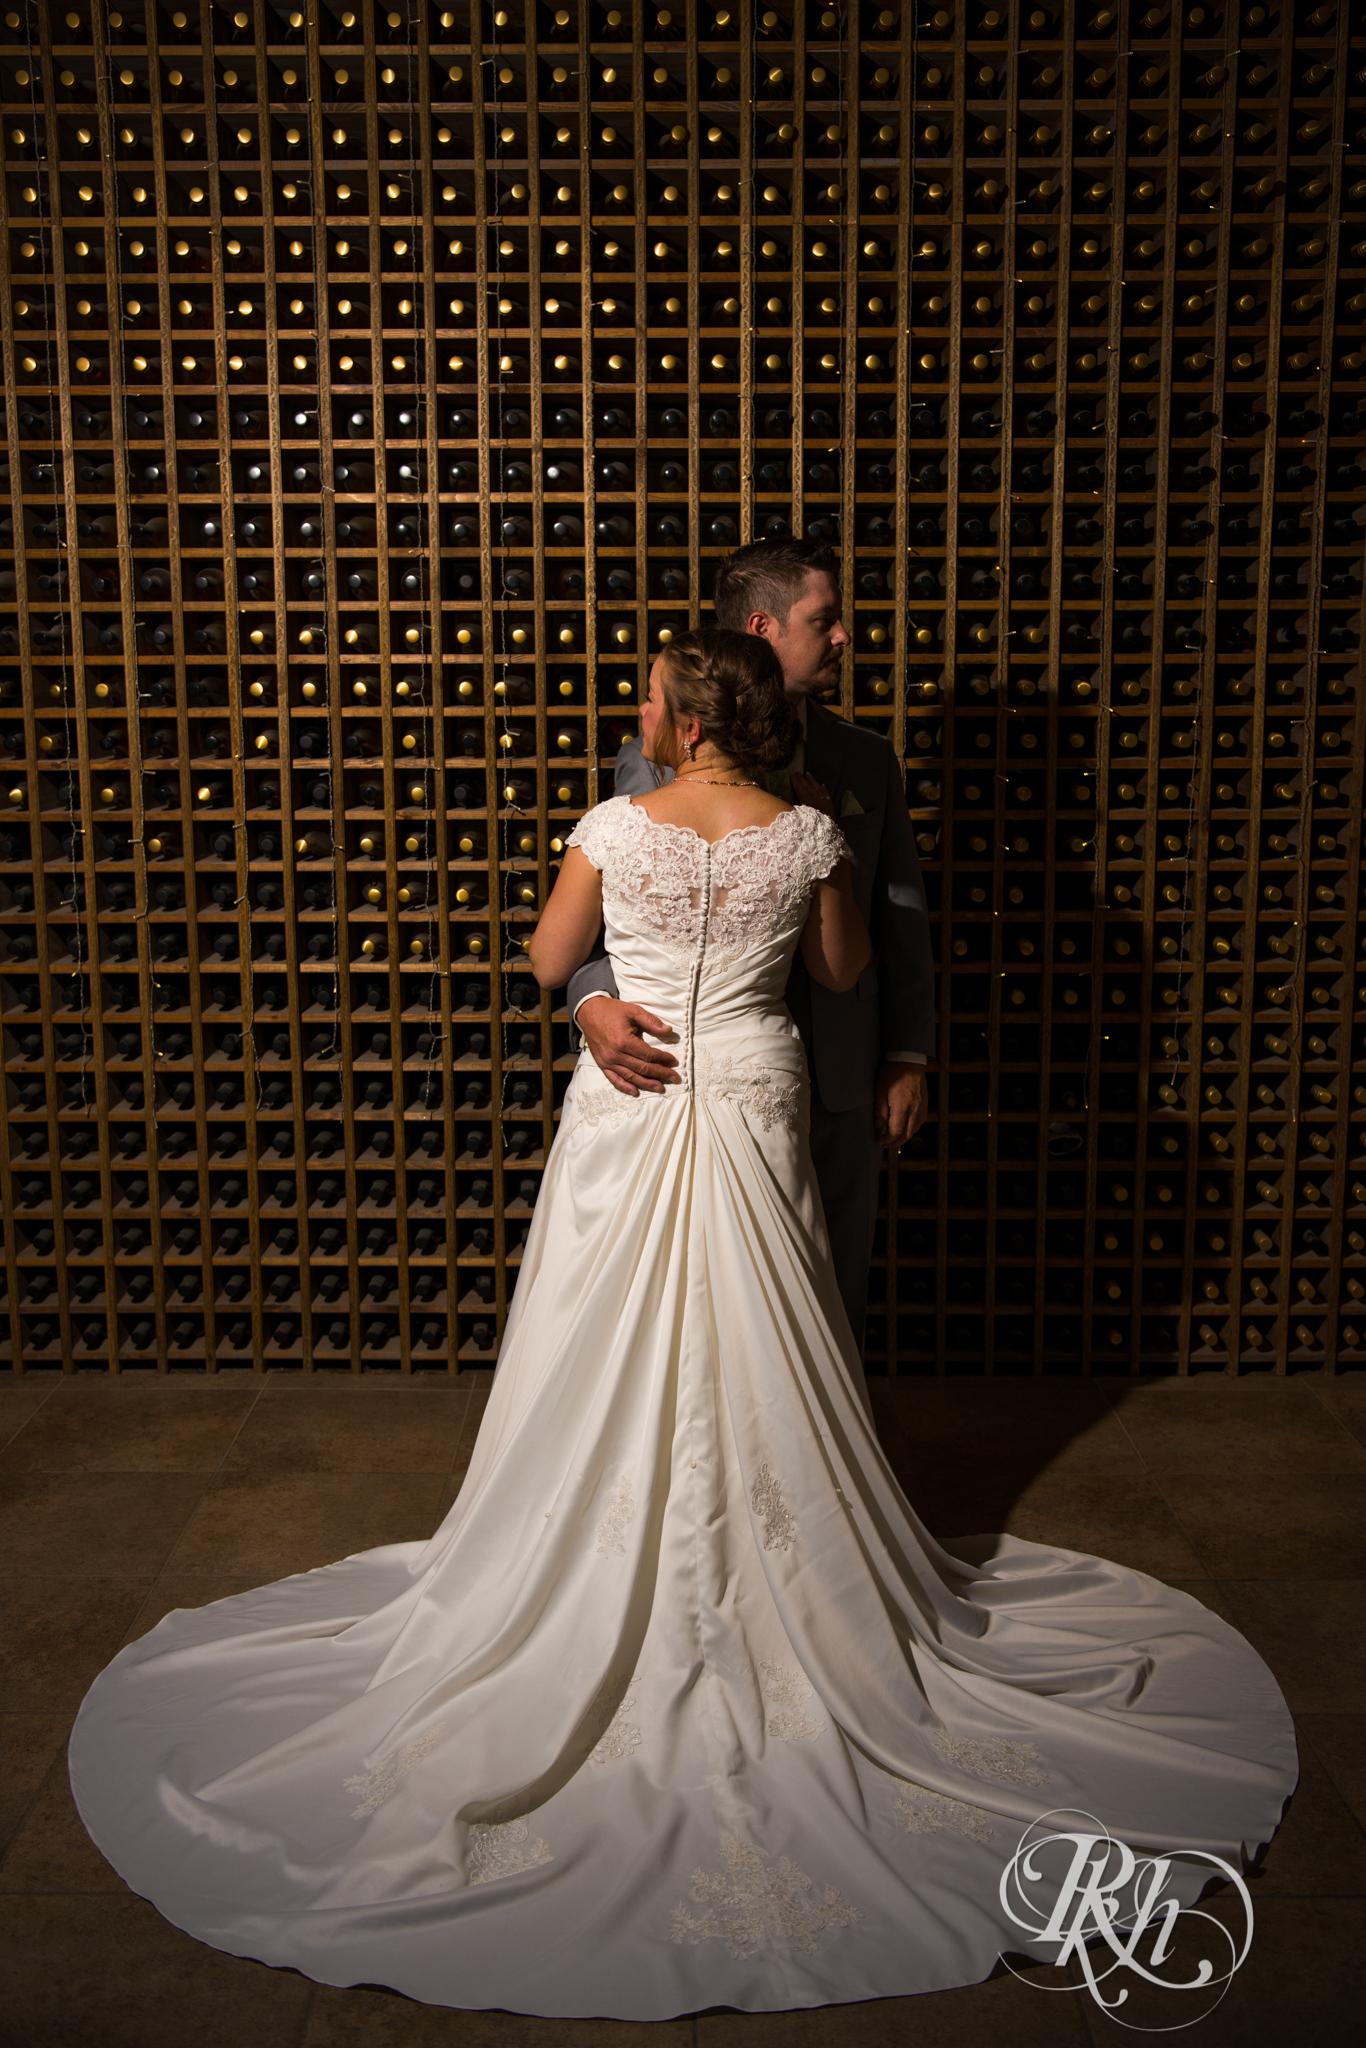 Ally & Nick - Minnesota Wedding Photography - Next Chapter Winery - RKH Images - Blog (31 of 57).jpg